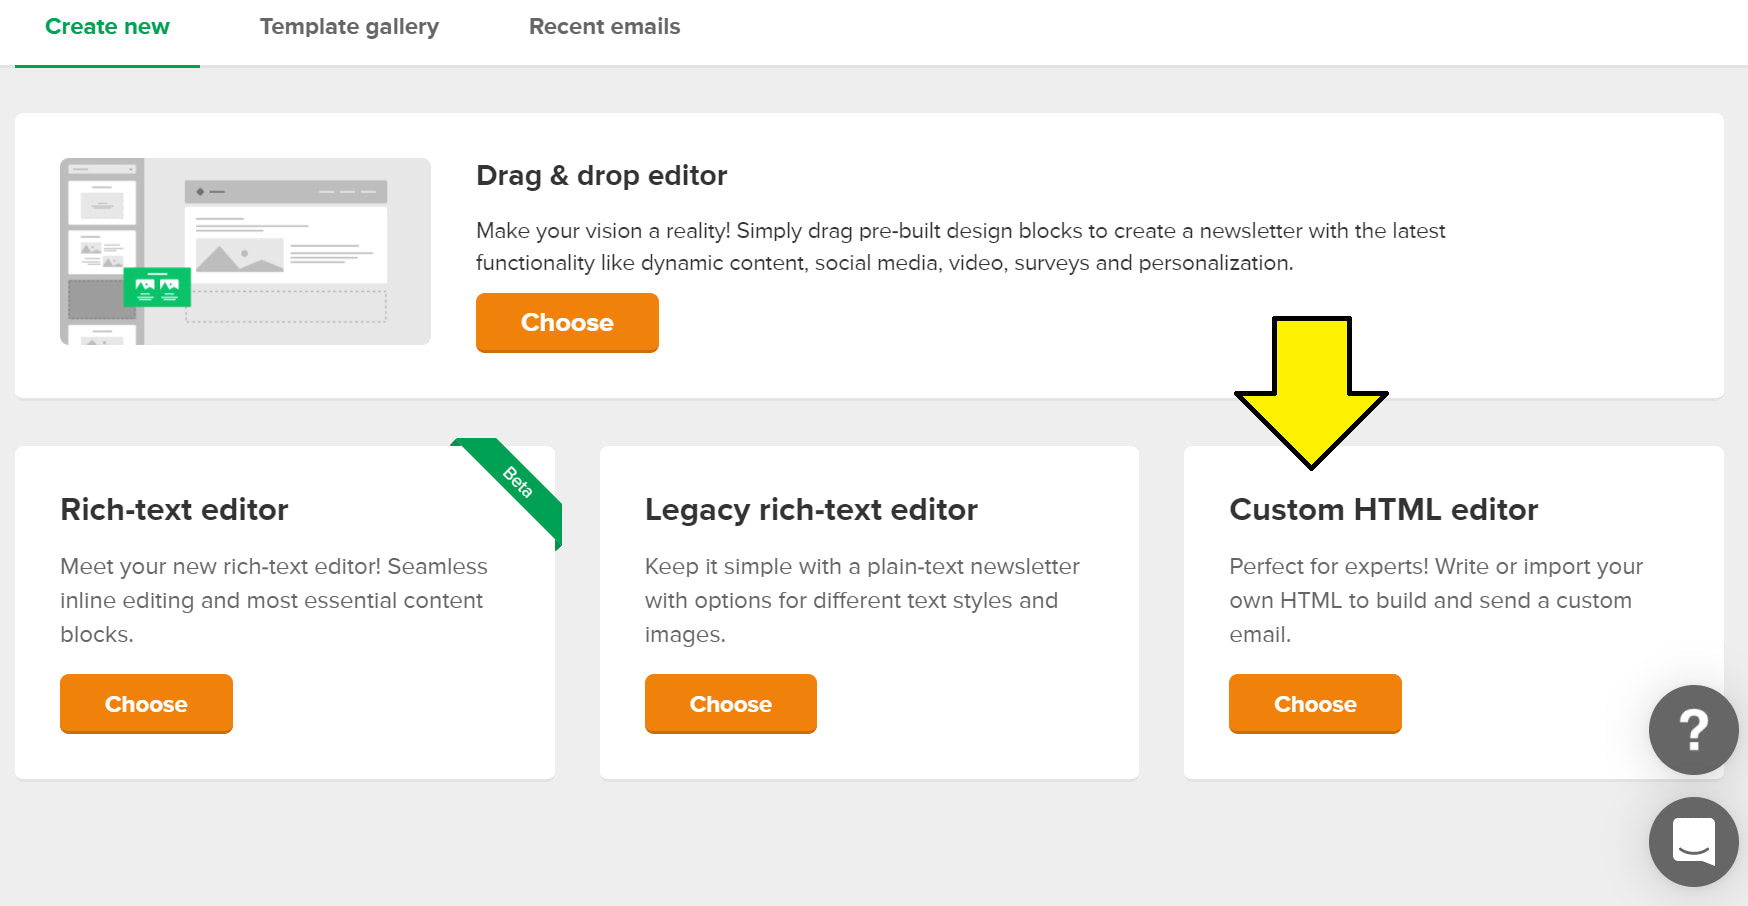 Custom HTML editor